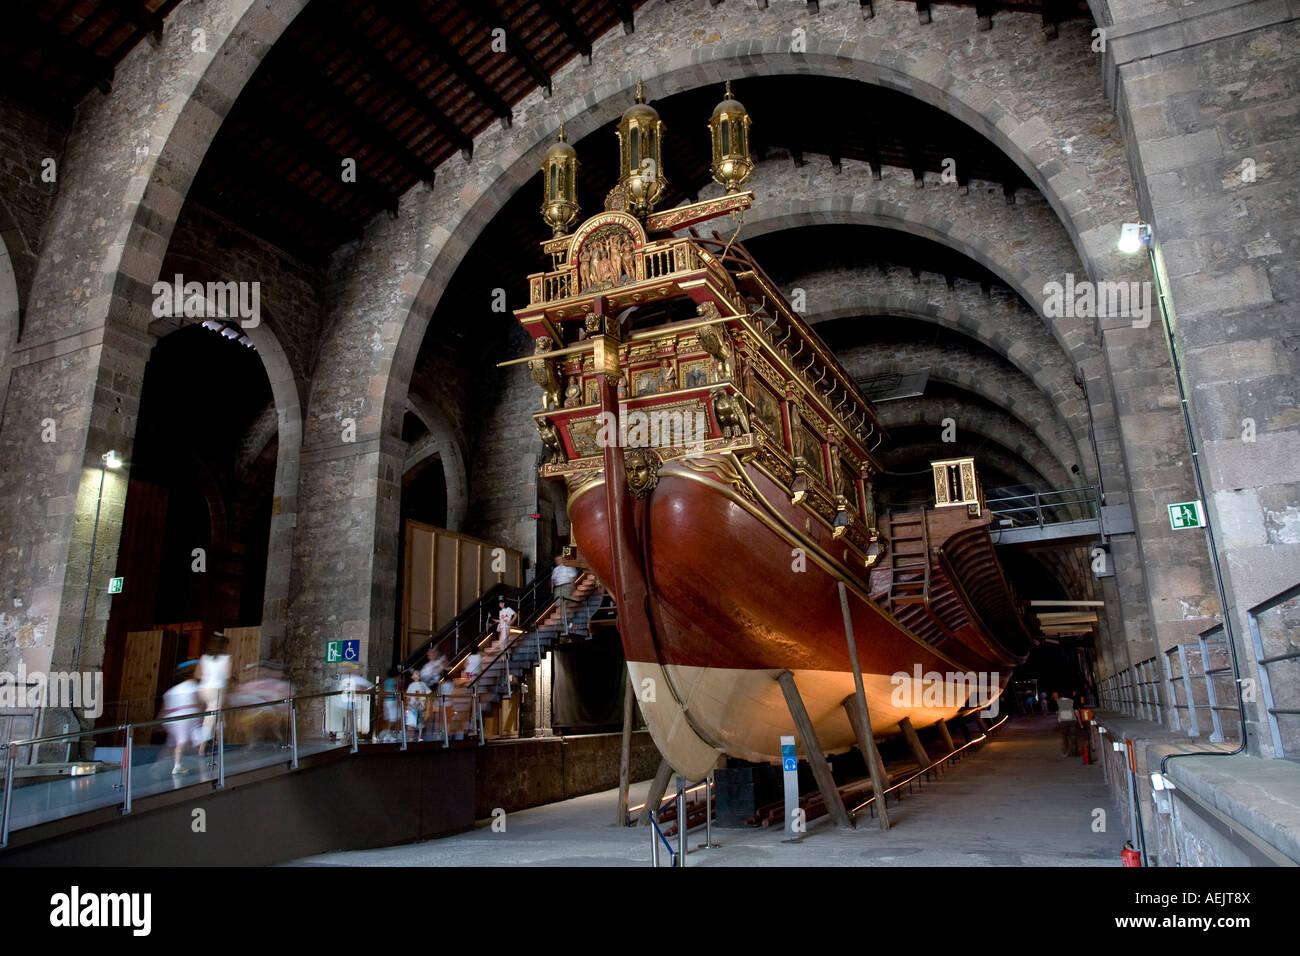 Galley, Relais Drassanes, Museu Maritim, Barcelona, Catalonia, Spain Stock Photo